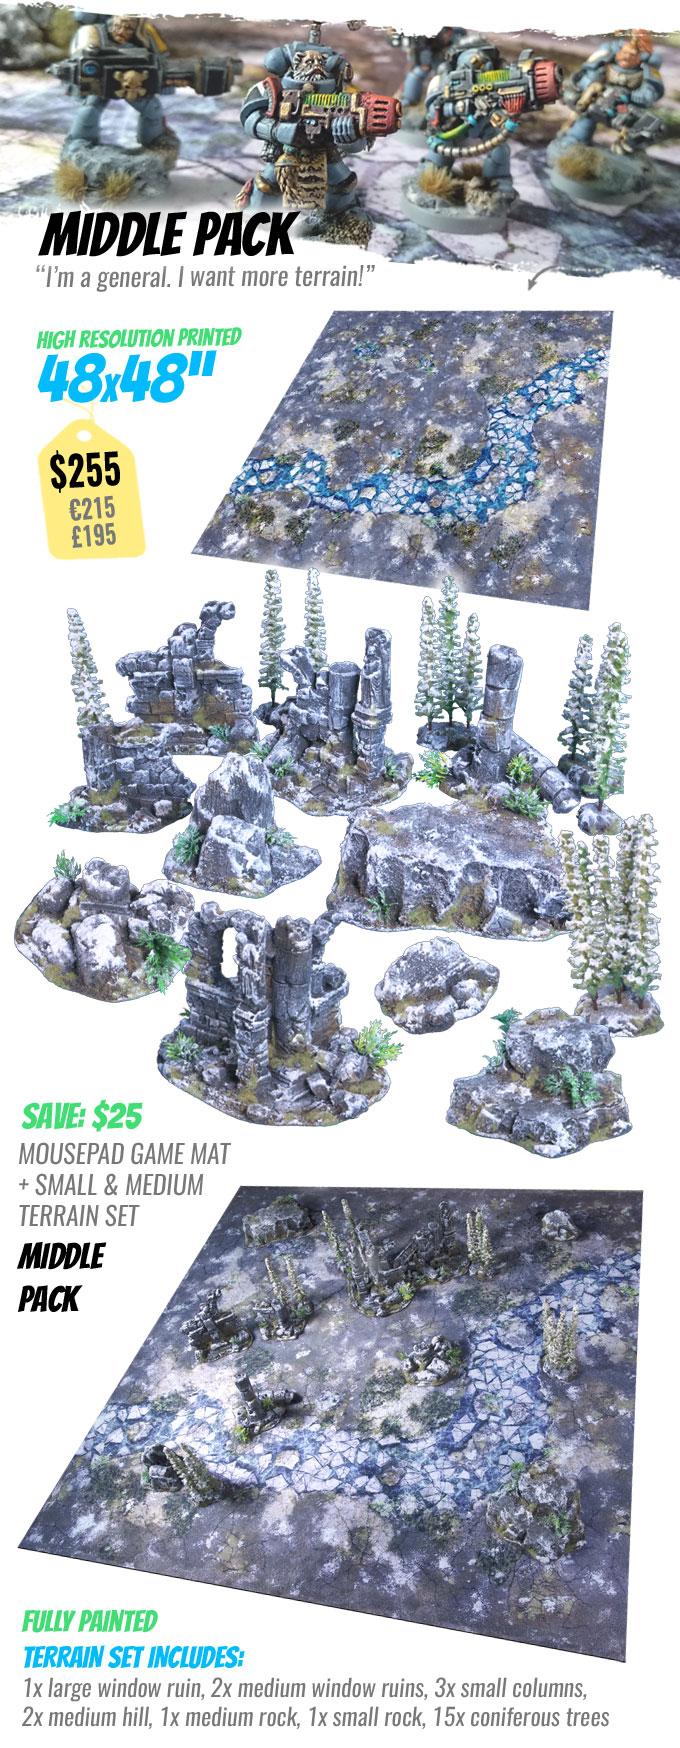 MIDDLE PACK: StudioLevel GÅRDBÛK Shrine Terrain